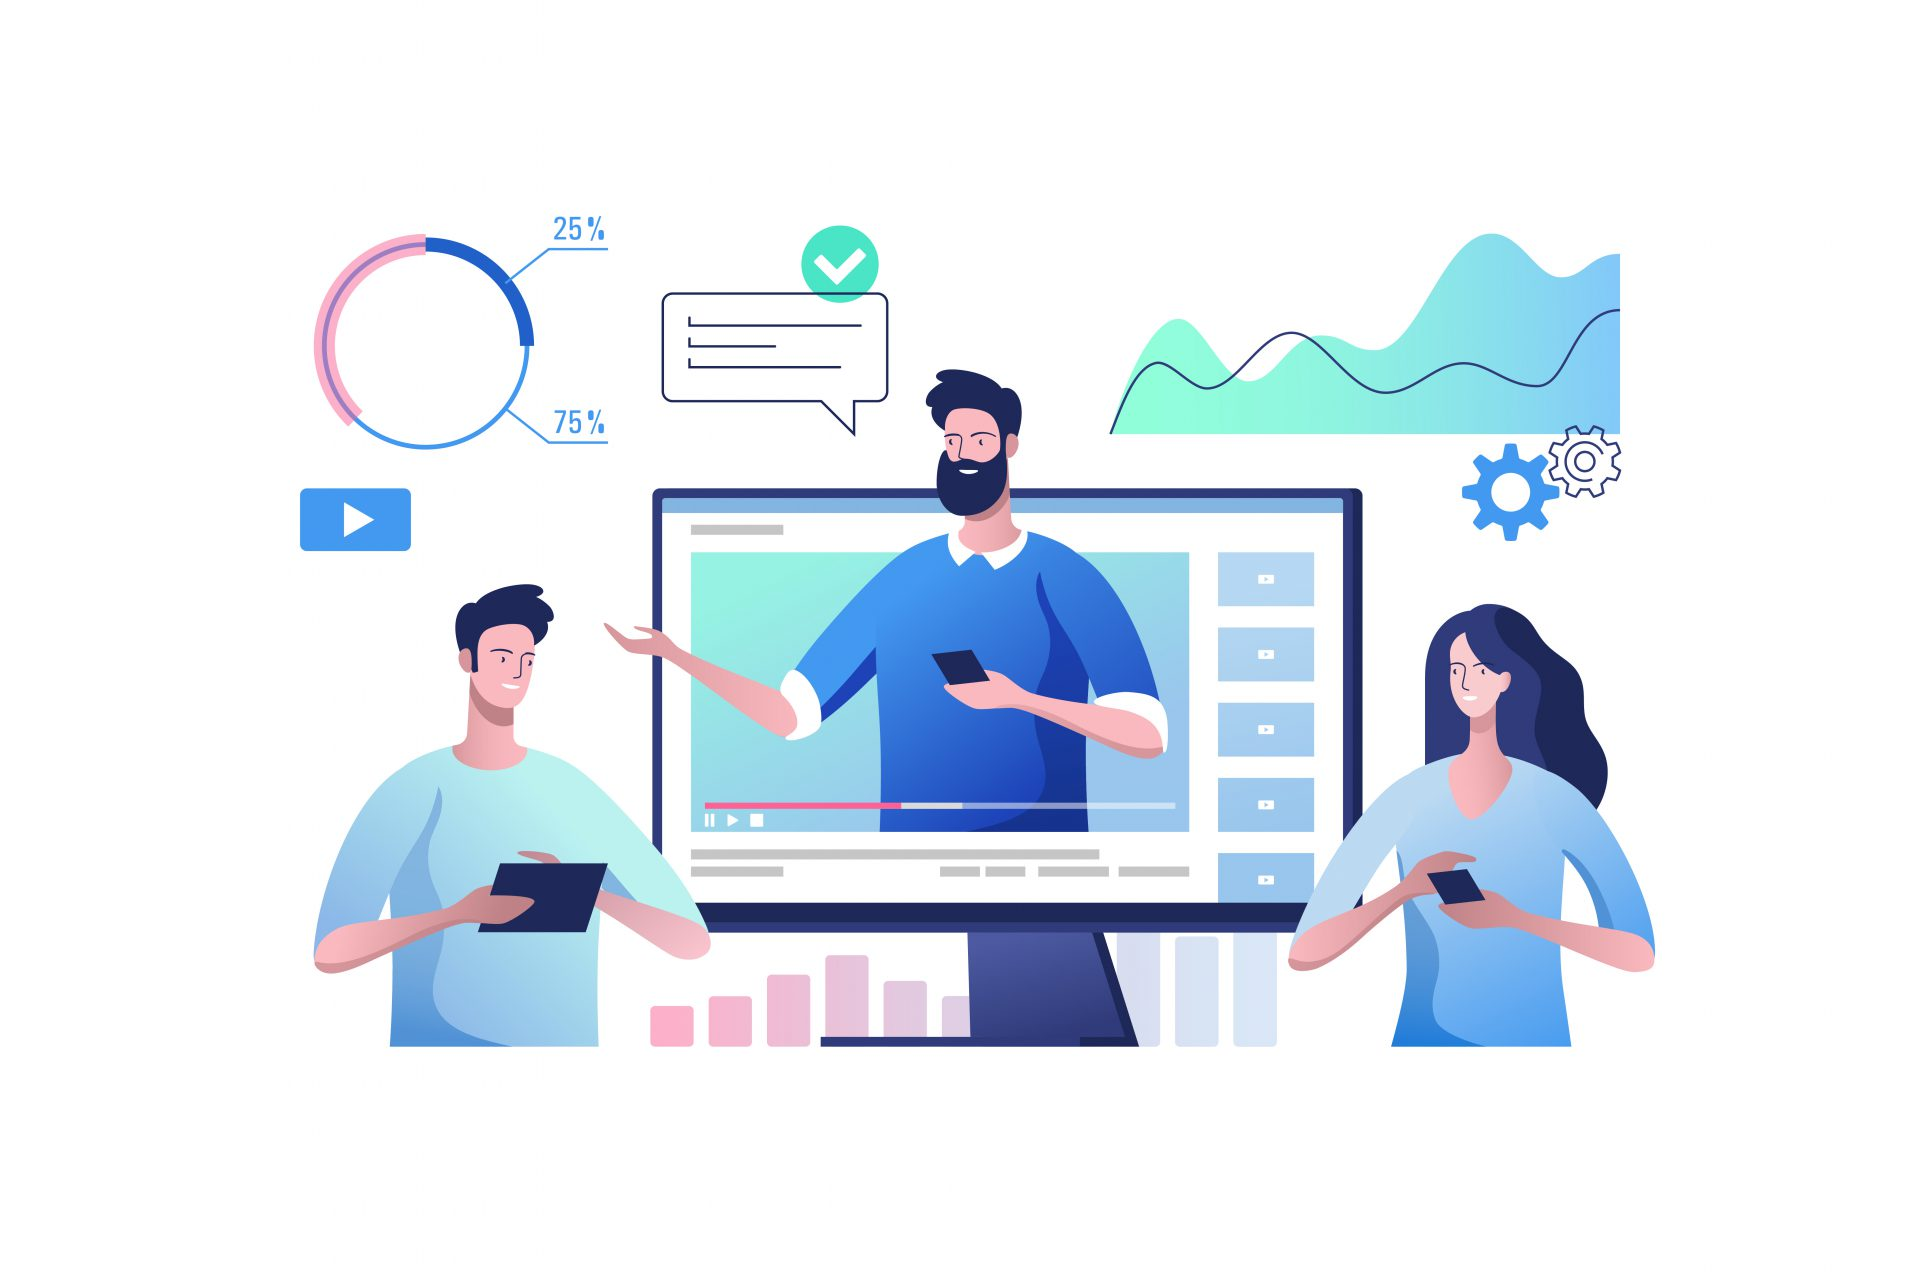 Vídeos Explicativos para Fortalecer sua Startup